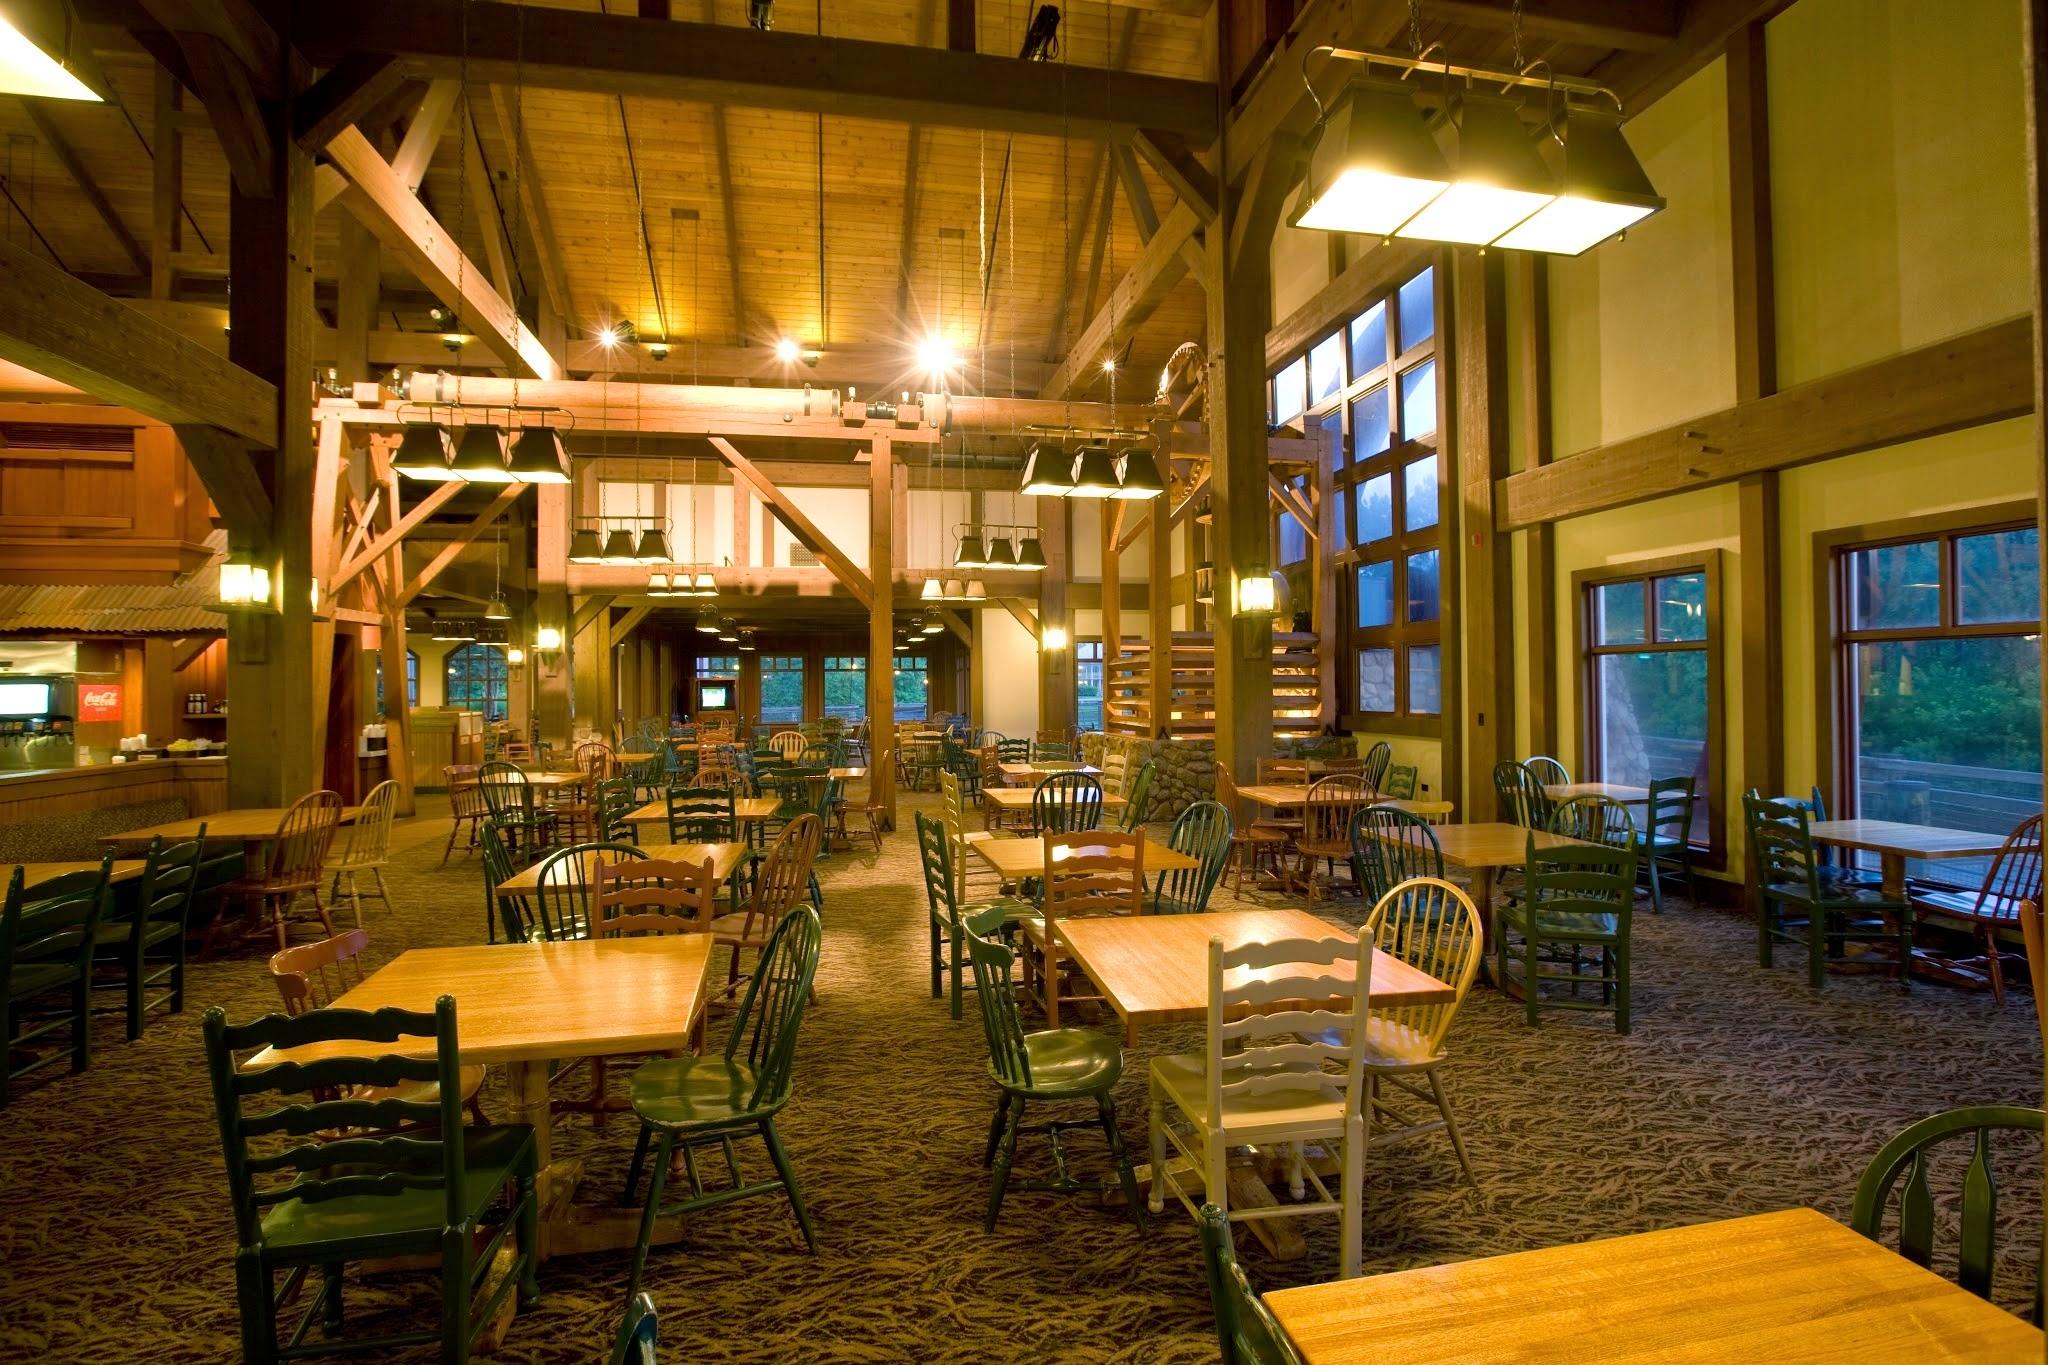 Riverside Mill Food Court image 3